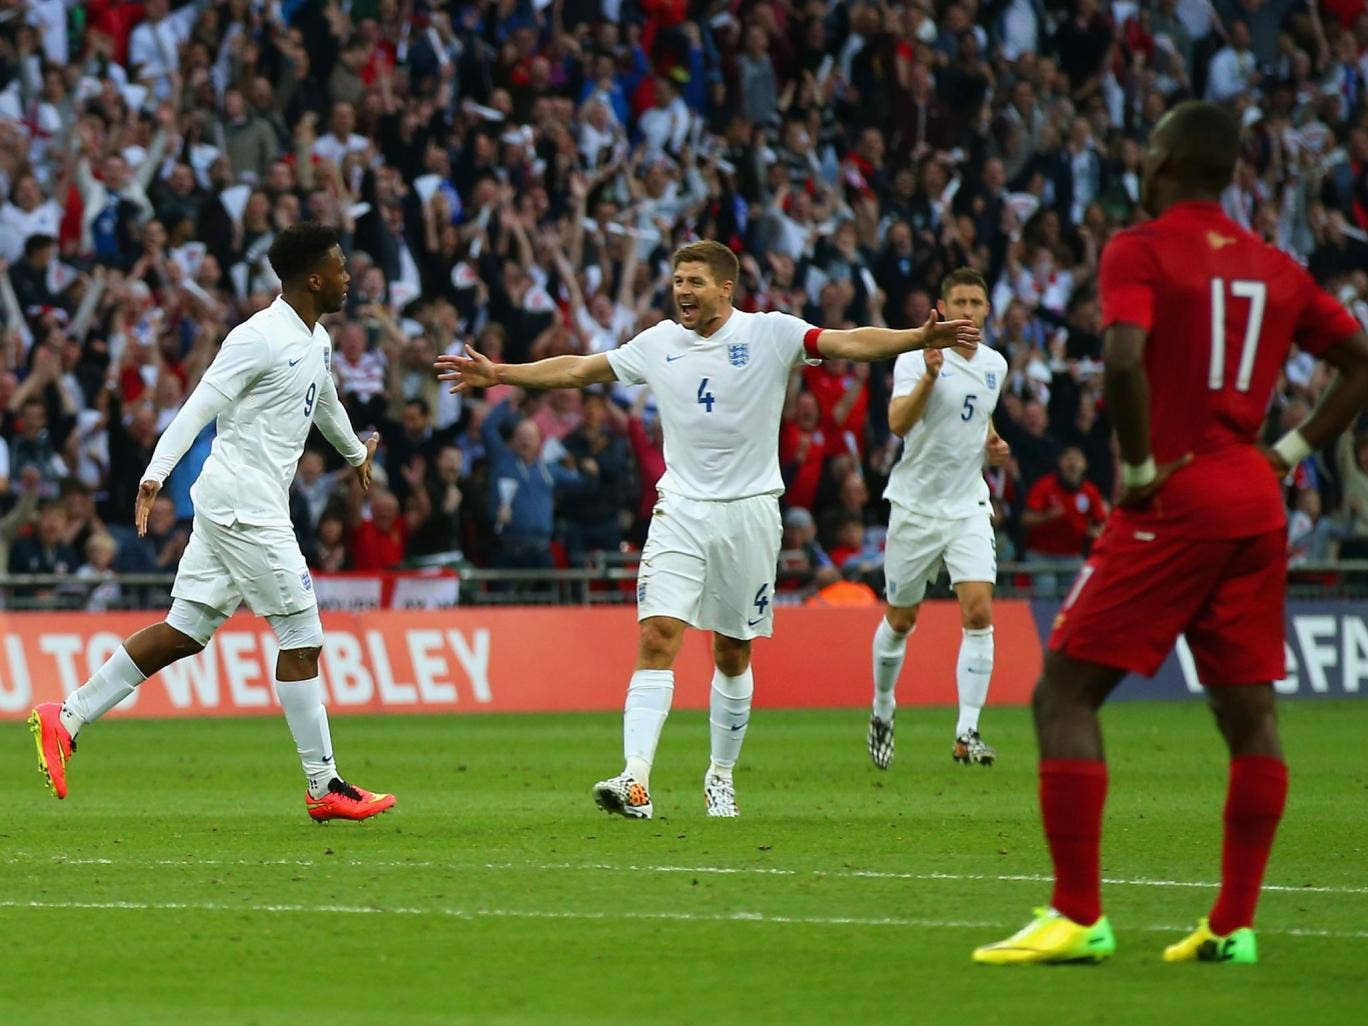 Steven Gerrard of England congratulates Daniel Sturridge of England on scoring the opening goal